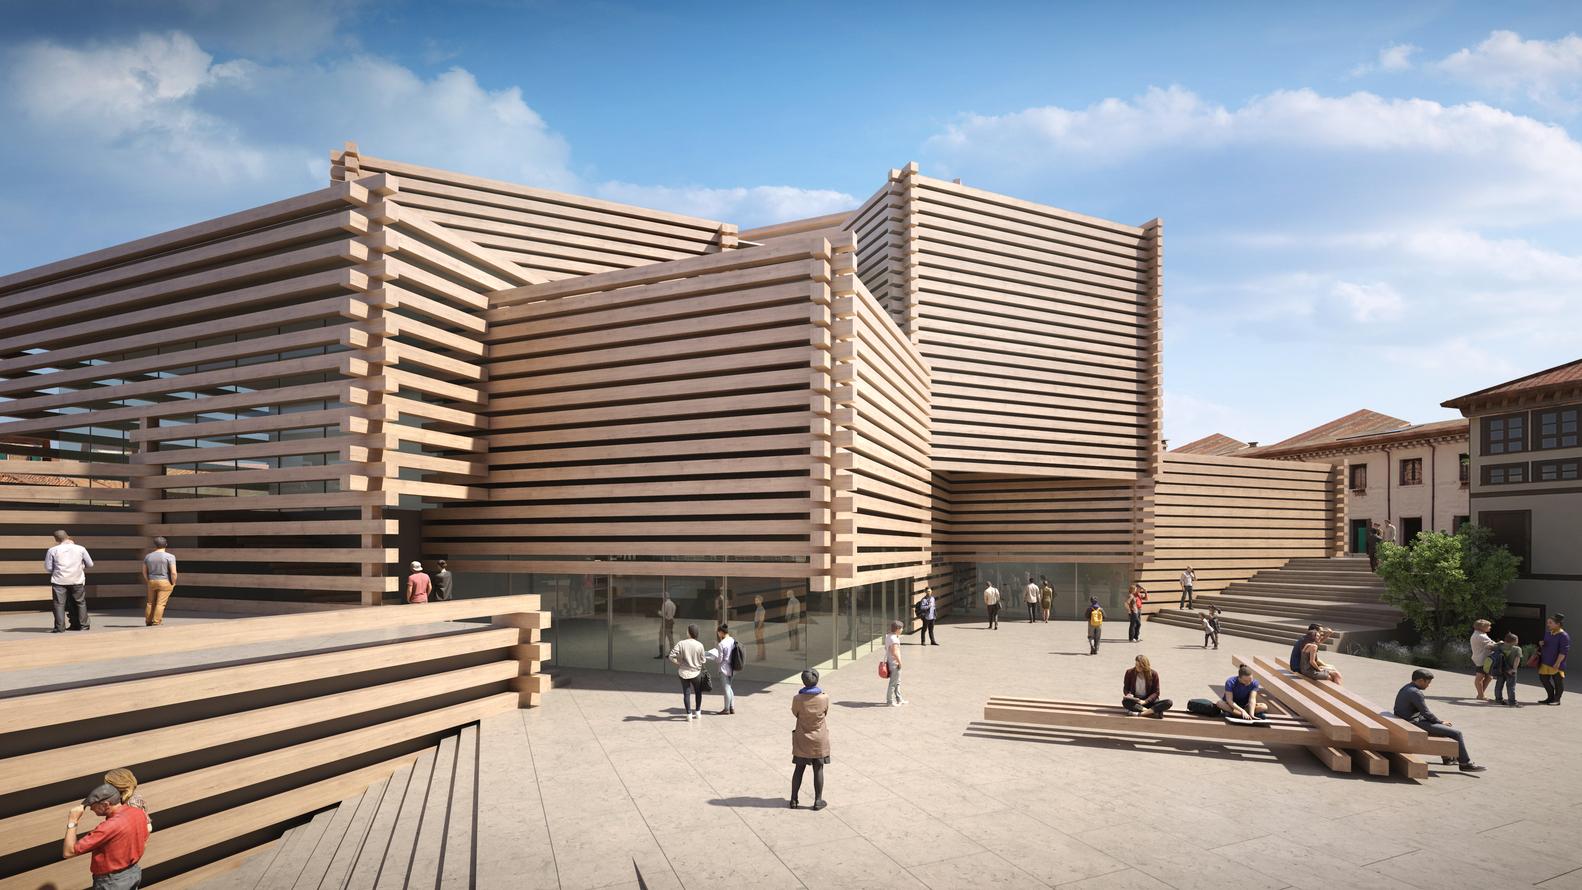 Kengo Kuma's Stacked Timber Museum in Turkey Opens in June,© Kengo Kuma and Associates